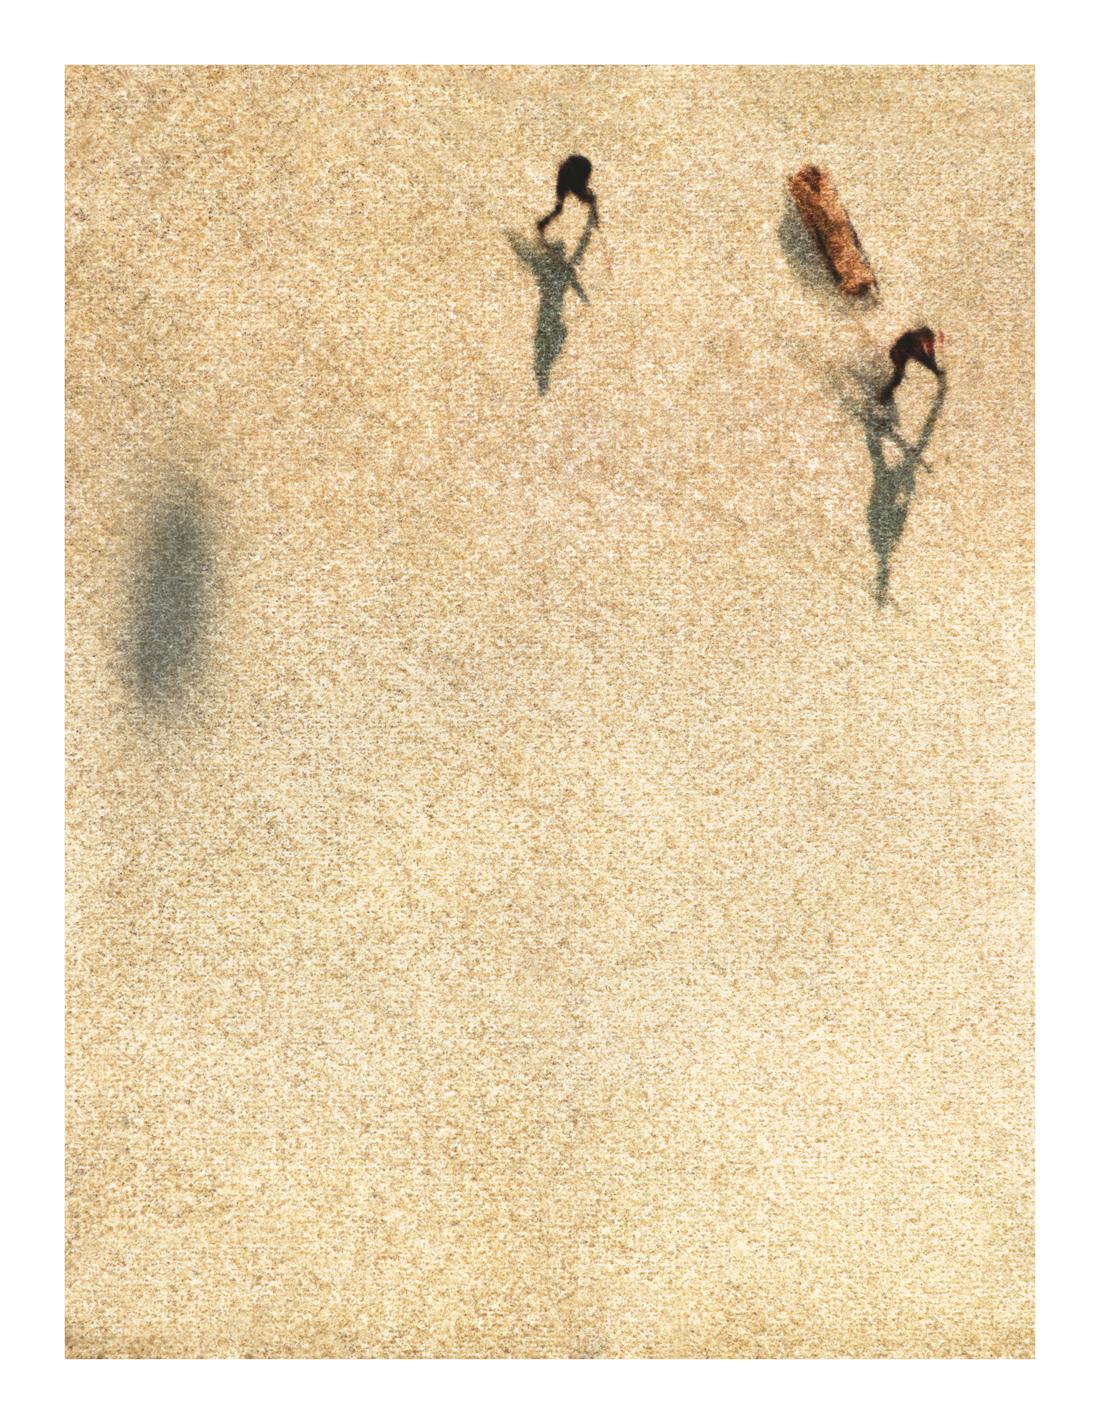 Aspen #5, 2007 (1996)